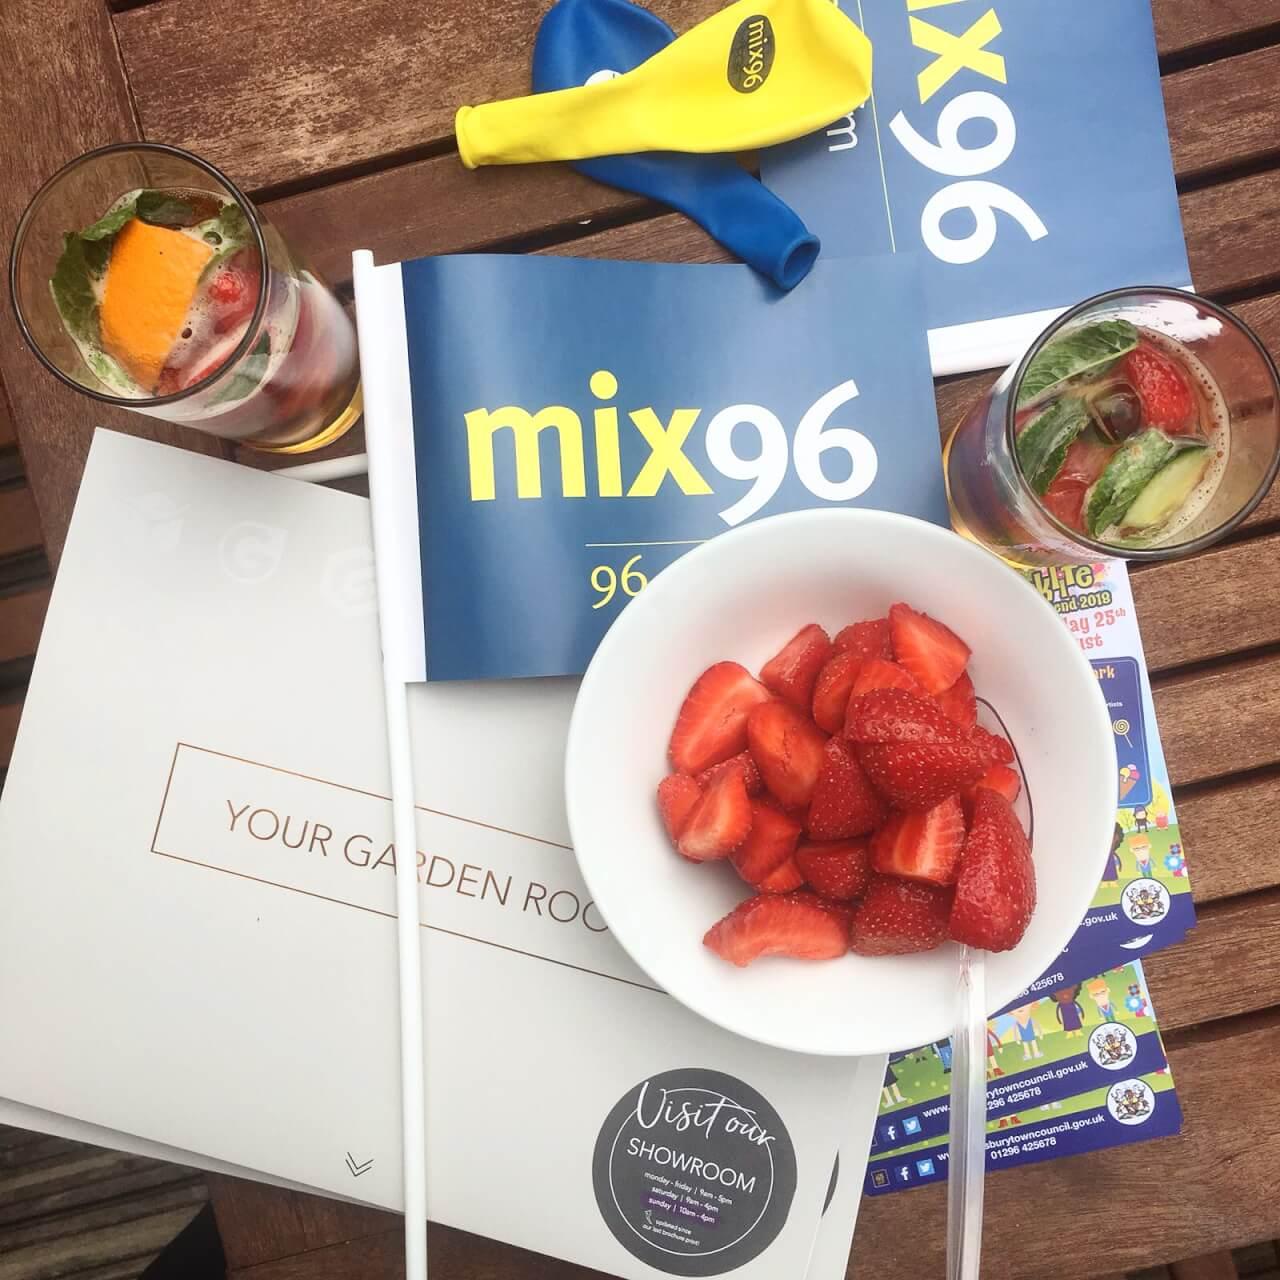 mix-96-duck-race-pimms